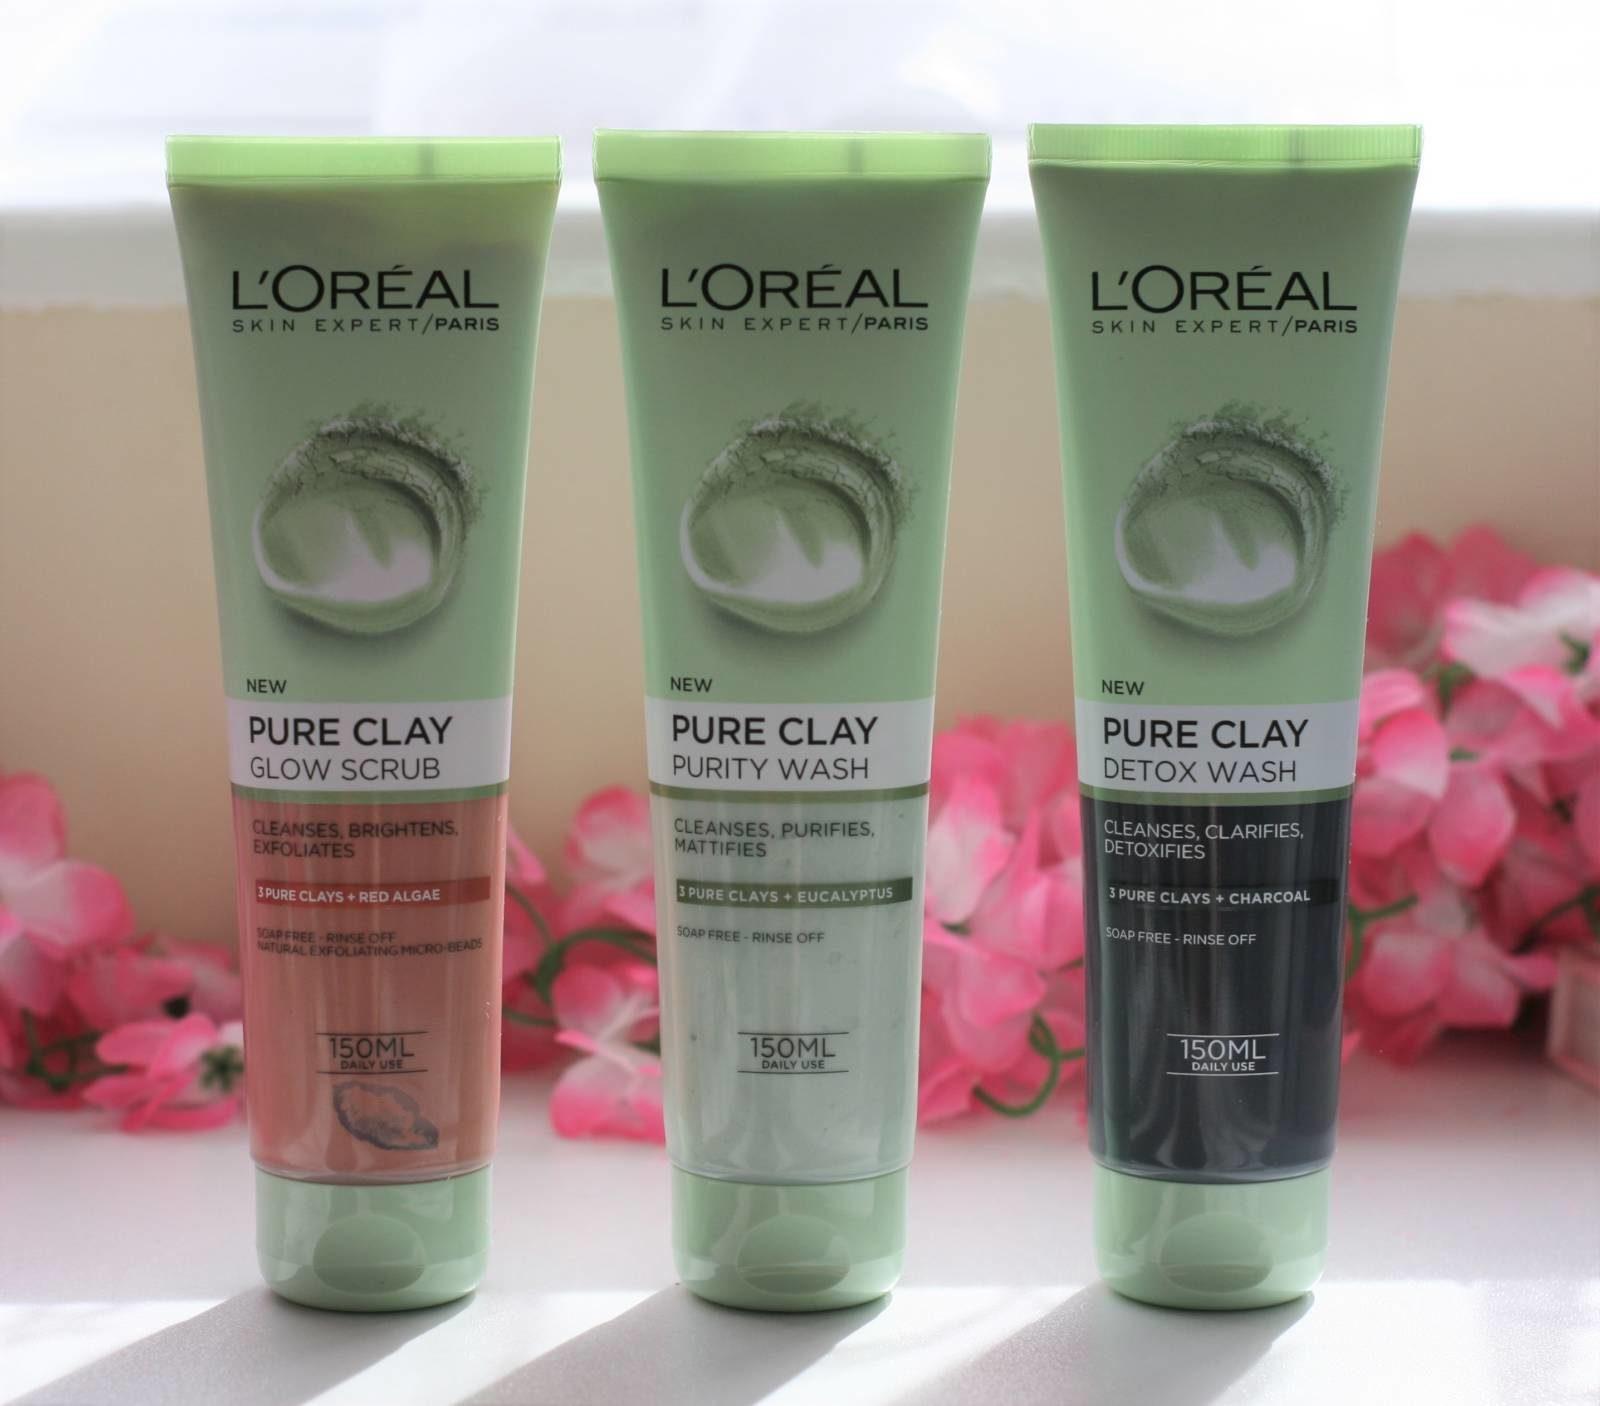 L'Oreal Pure Clay Face Wash Reviews